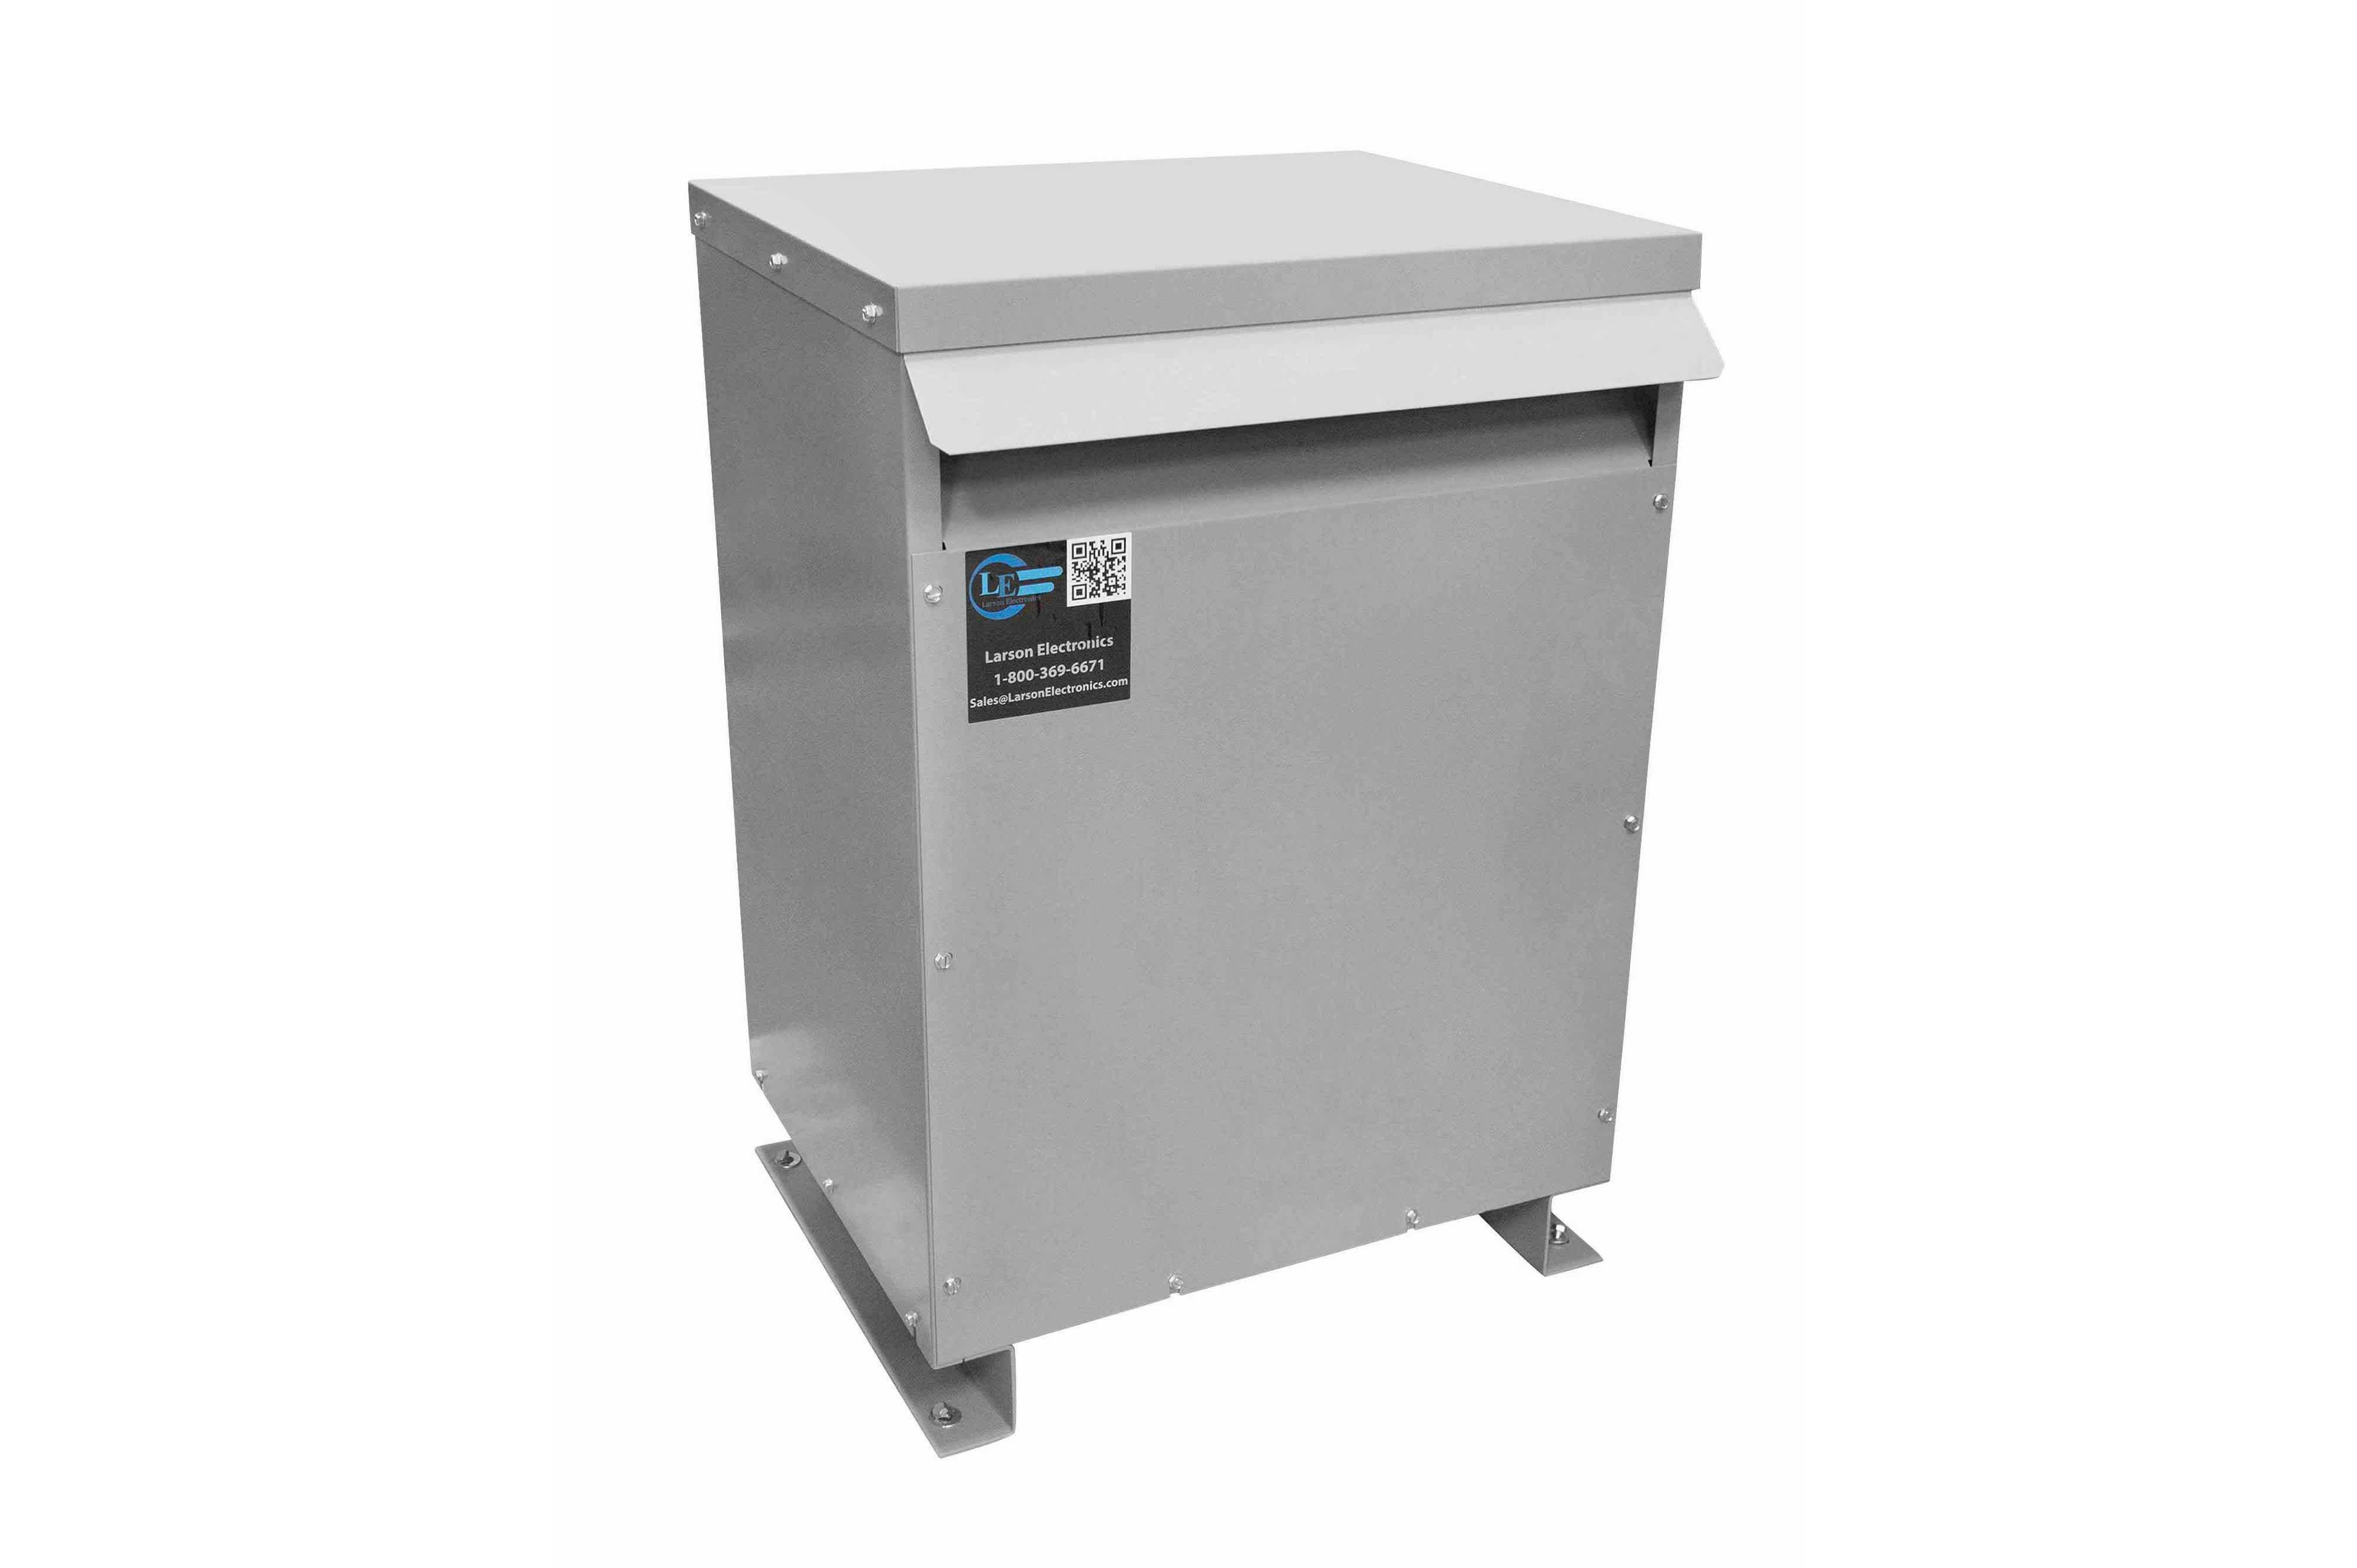 150 kVA 3PH Isolation Transformer, 230V Wye Primary, 208Y/120 Wye-N Secondary, N3R, Ventilated, 60 Hz